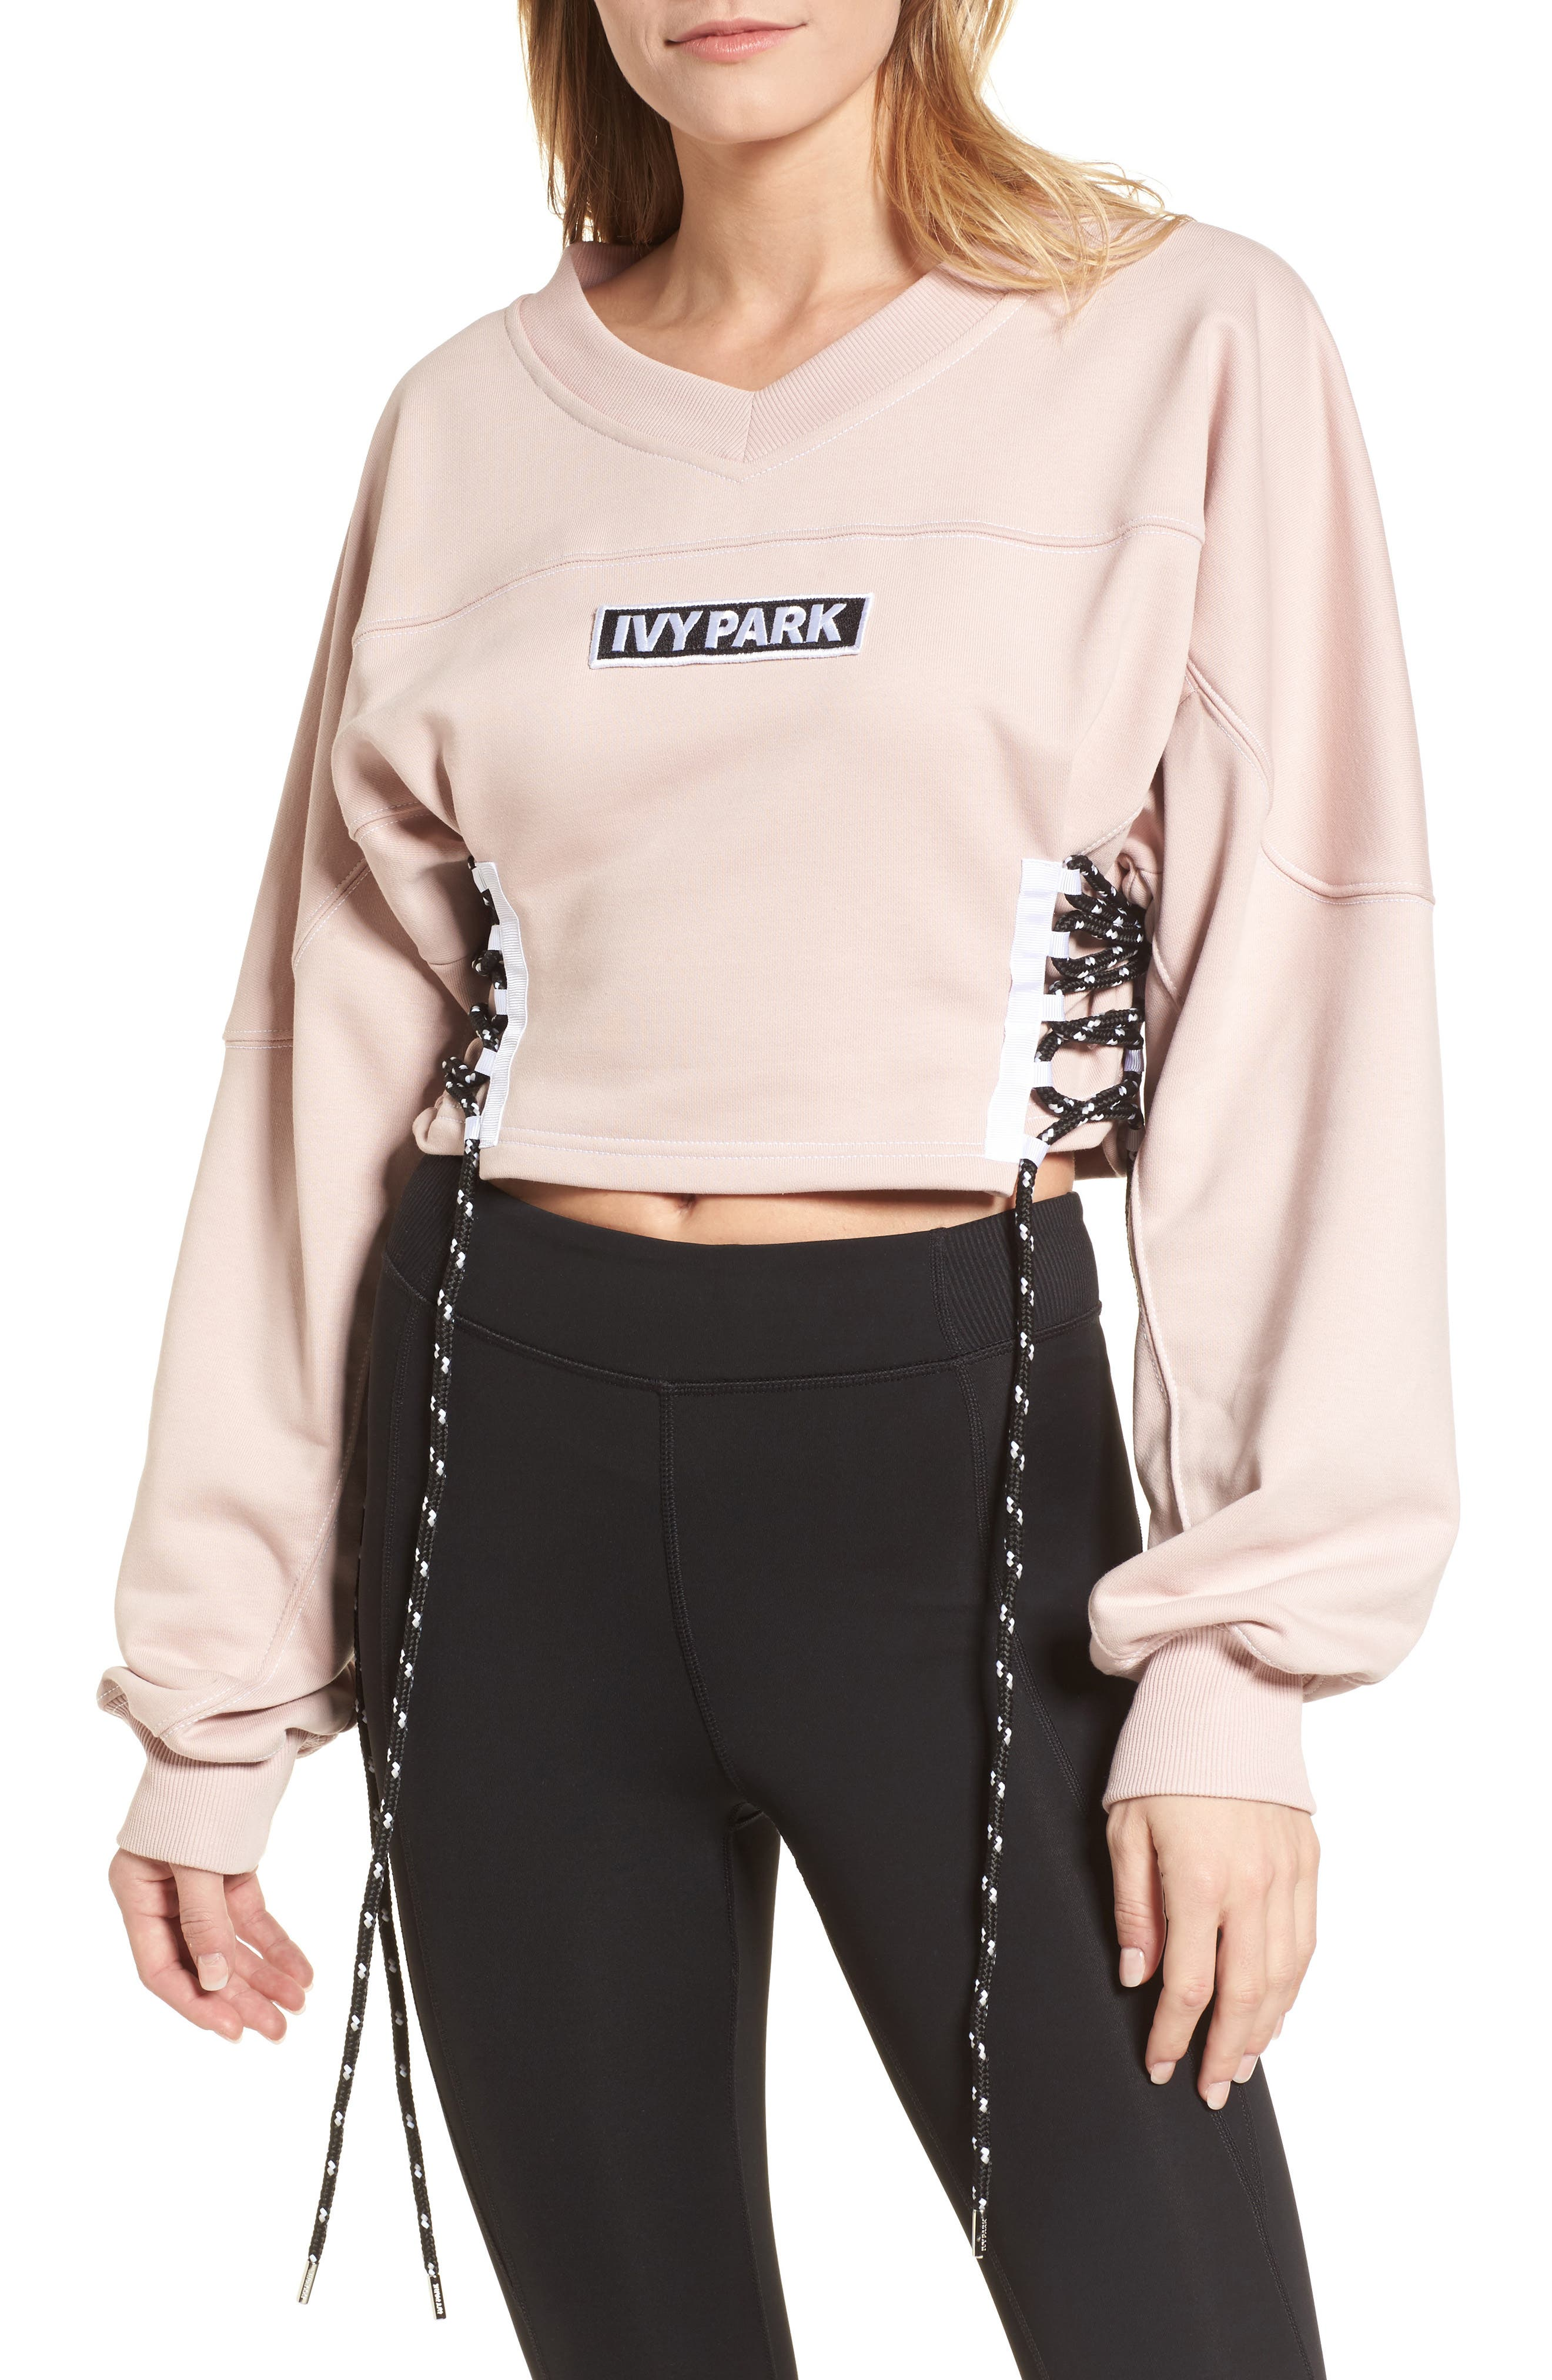 Main Image - IVY PARK® Football Lace-Up Sweatshirt